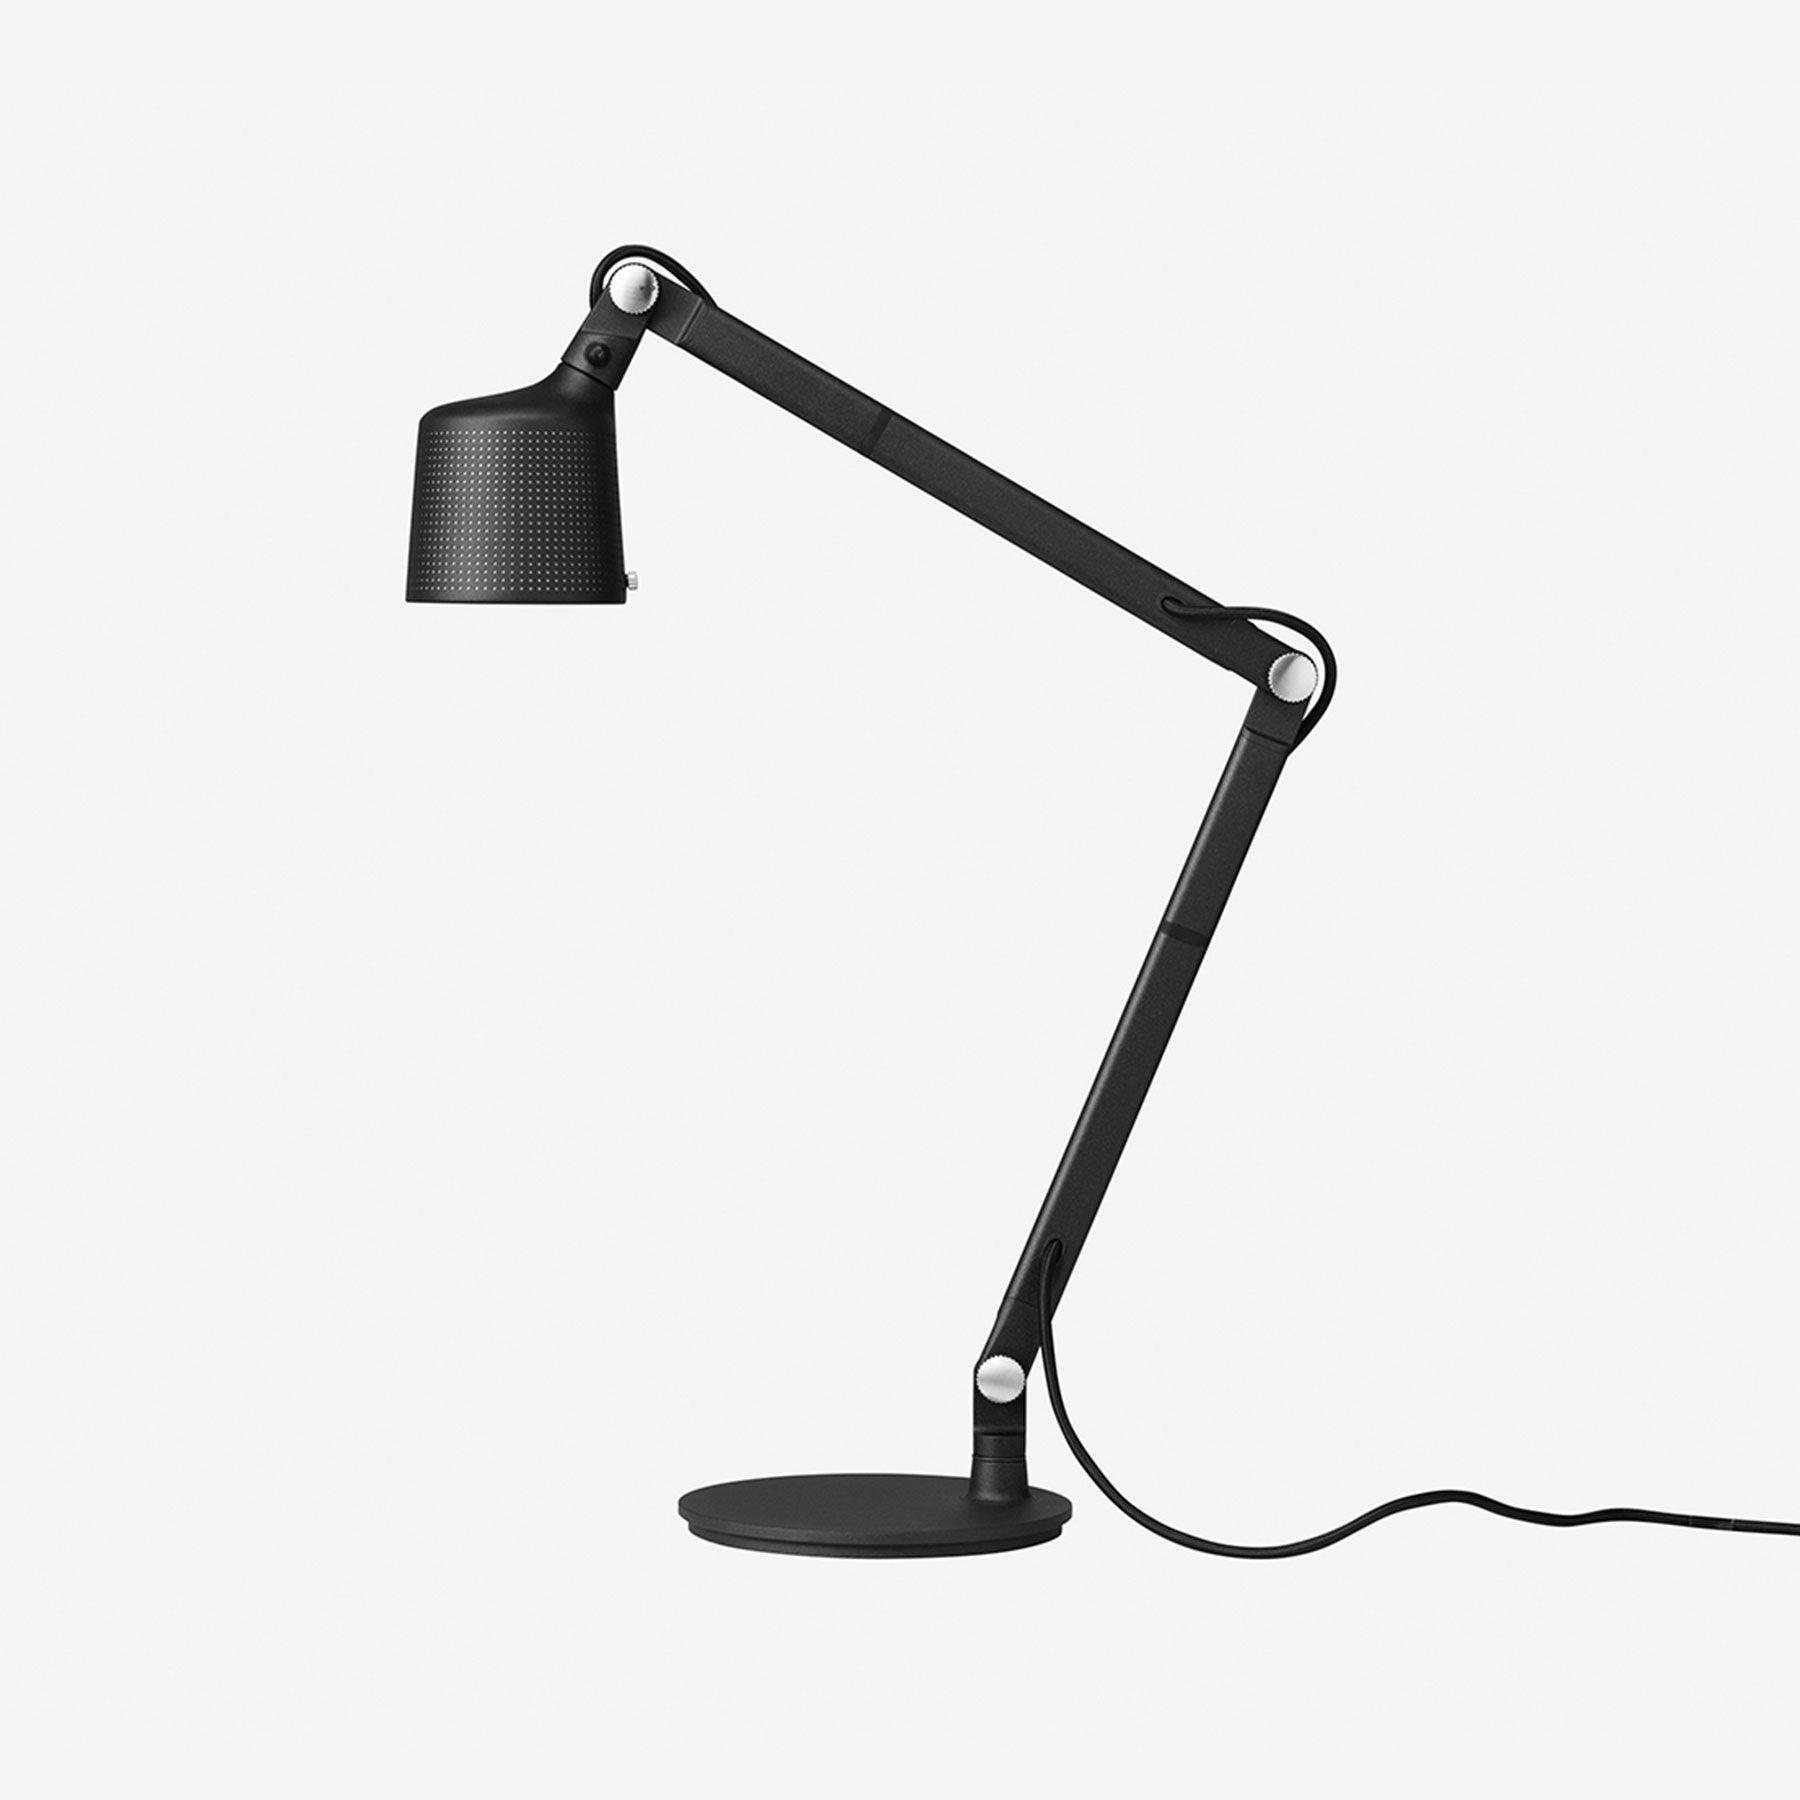 Vipp521 Schreibtischlampe Arbeitslampen Wandlampe